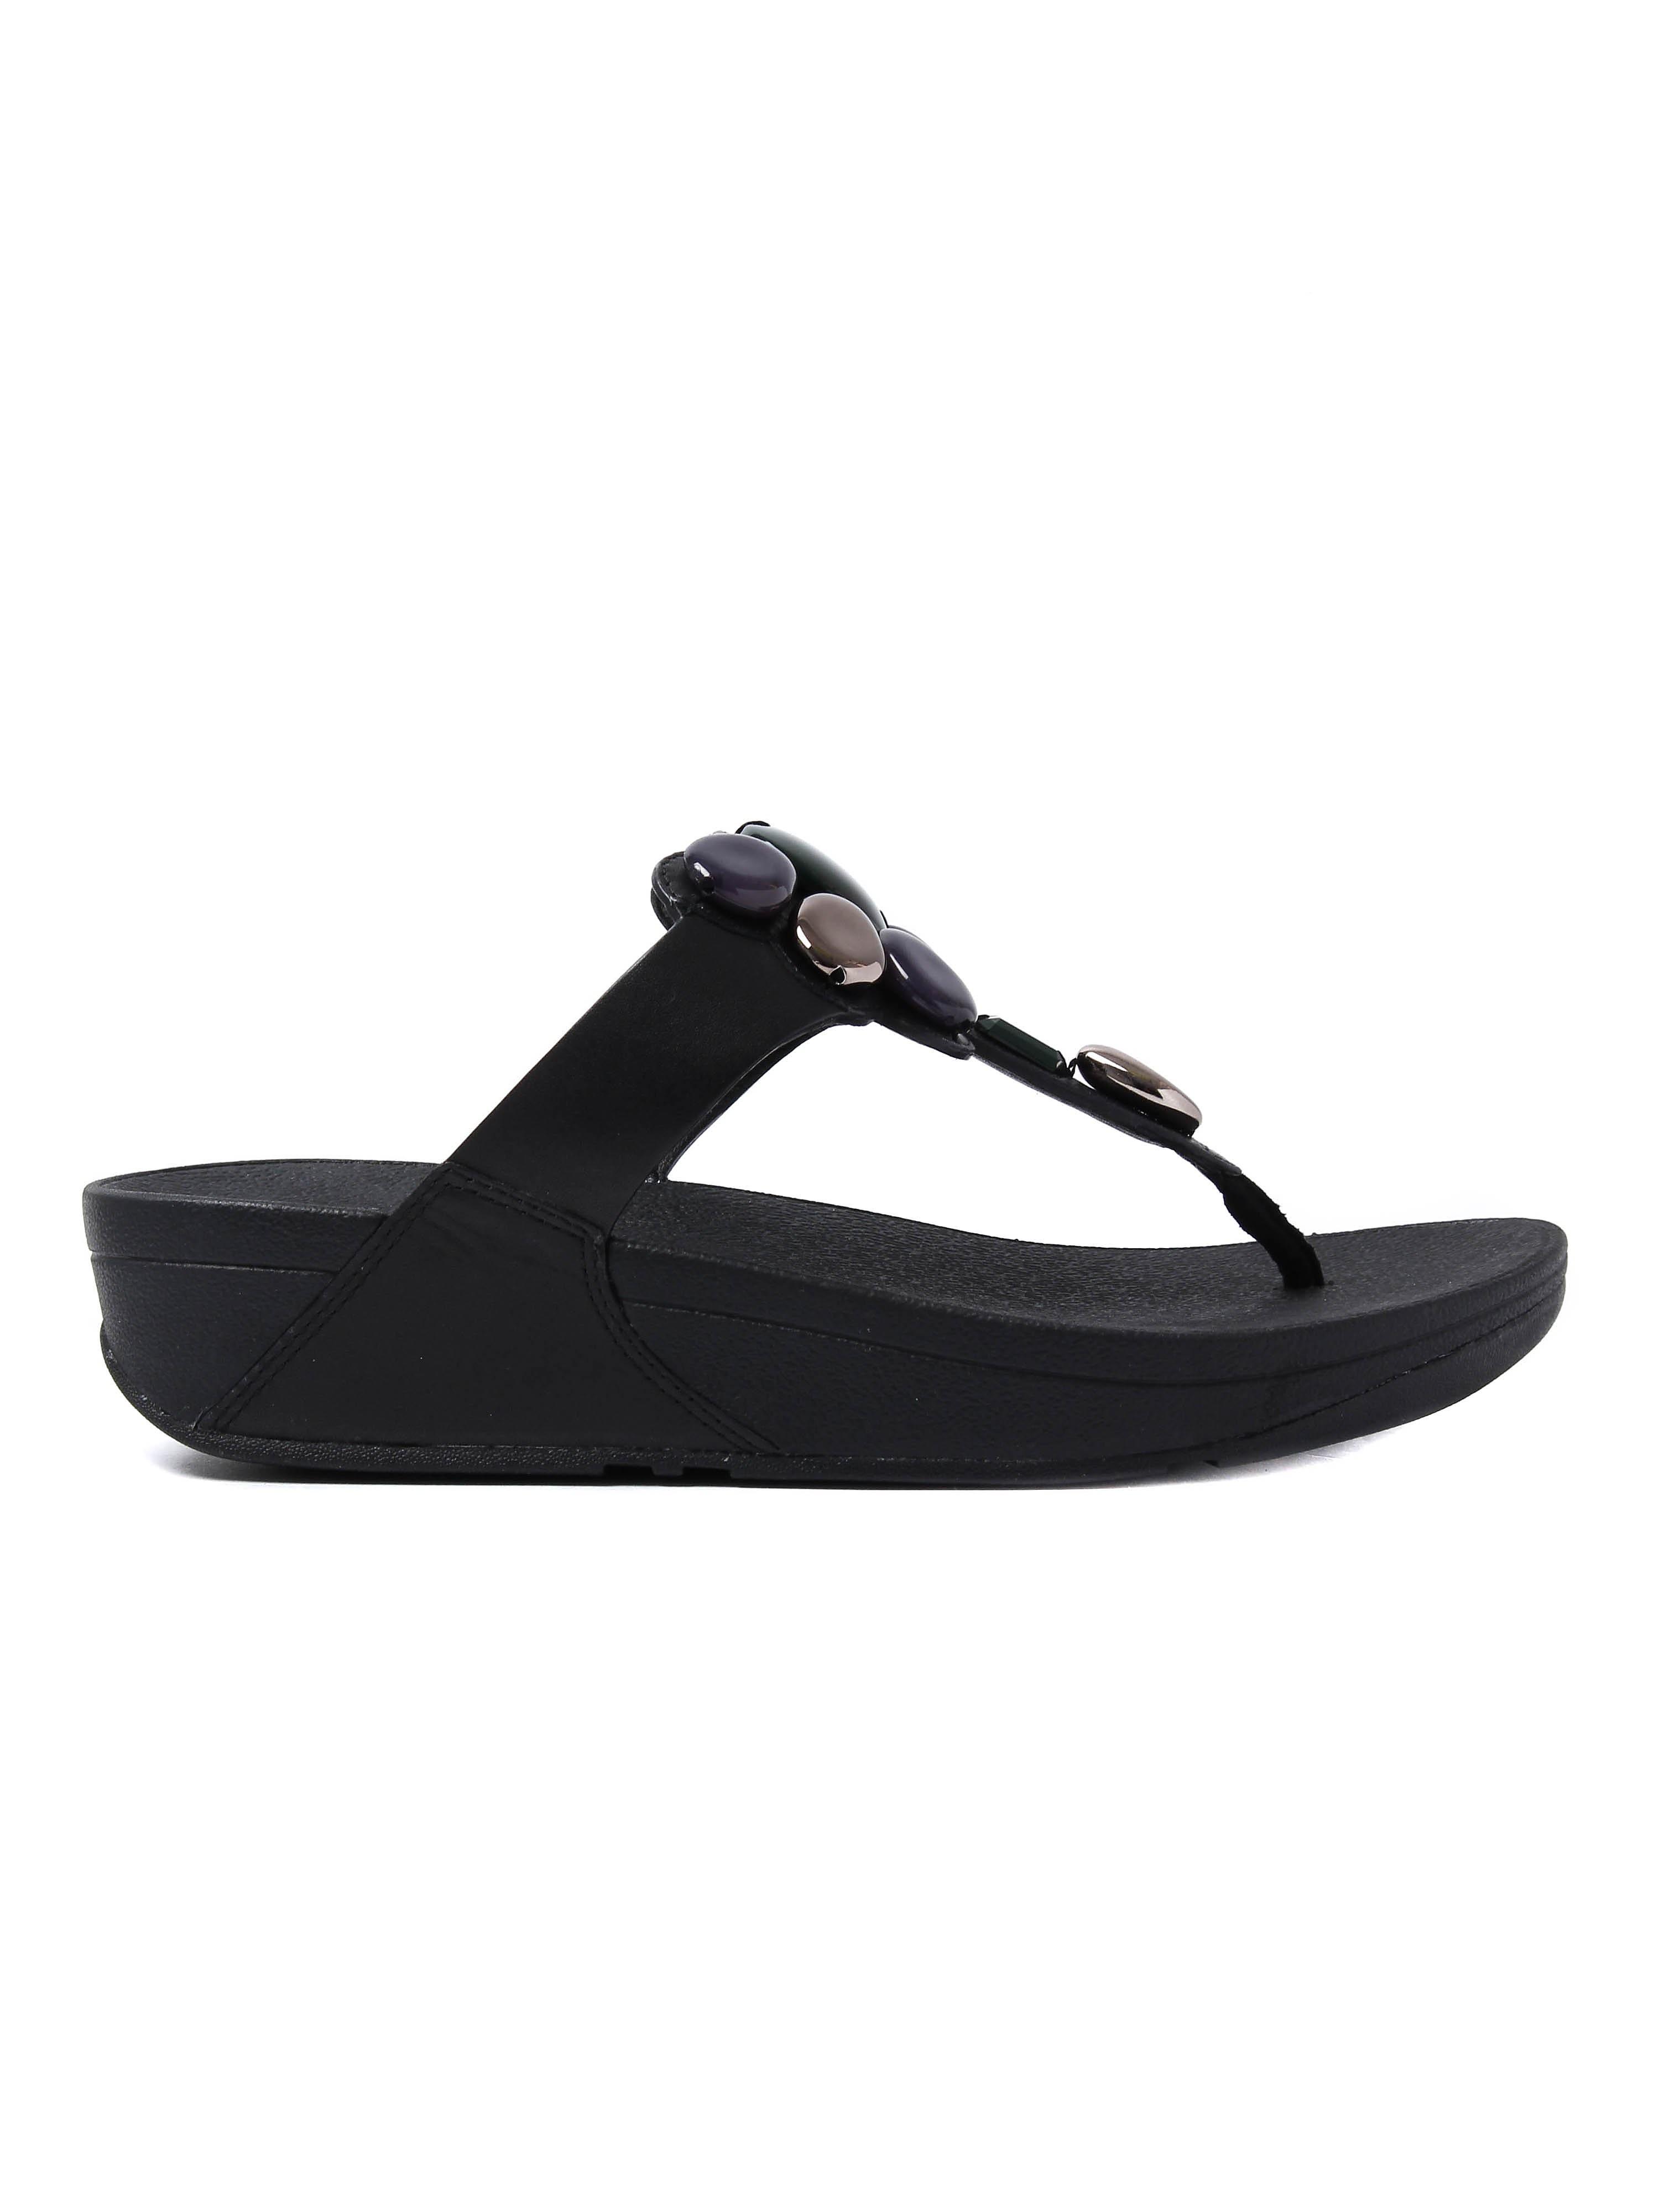 FitFlop Women's Honeybee Jewelled Sandals - Black Leather